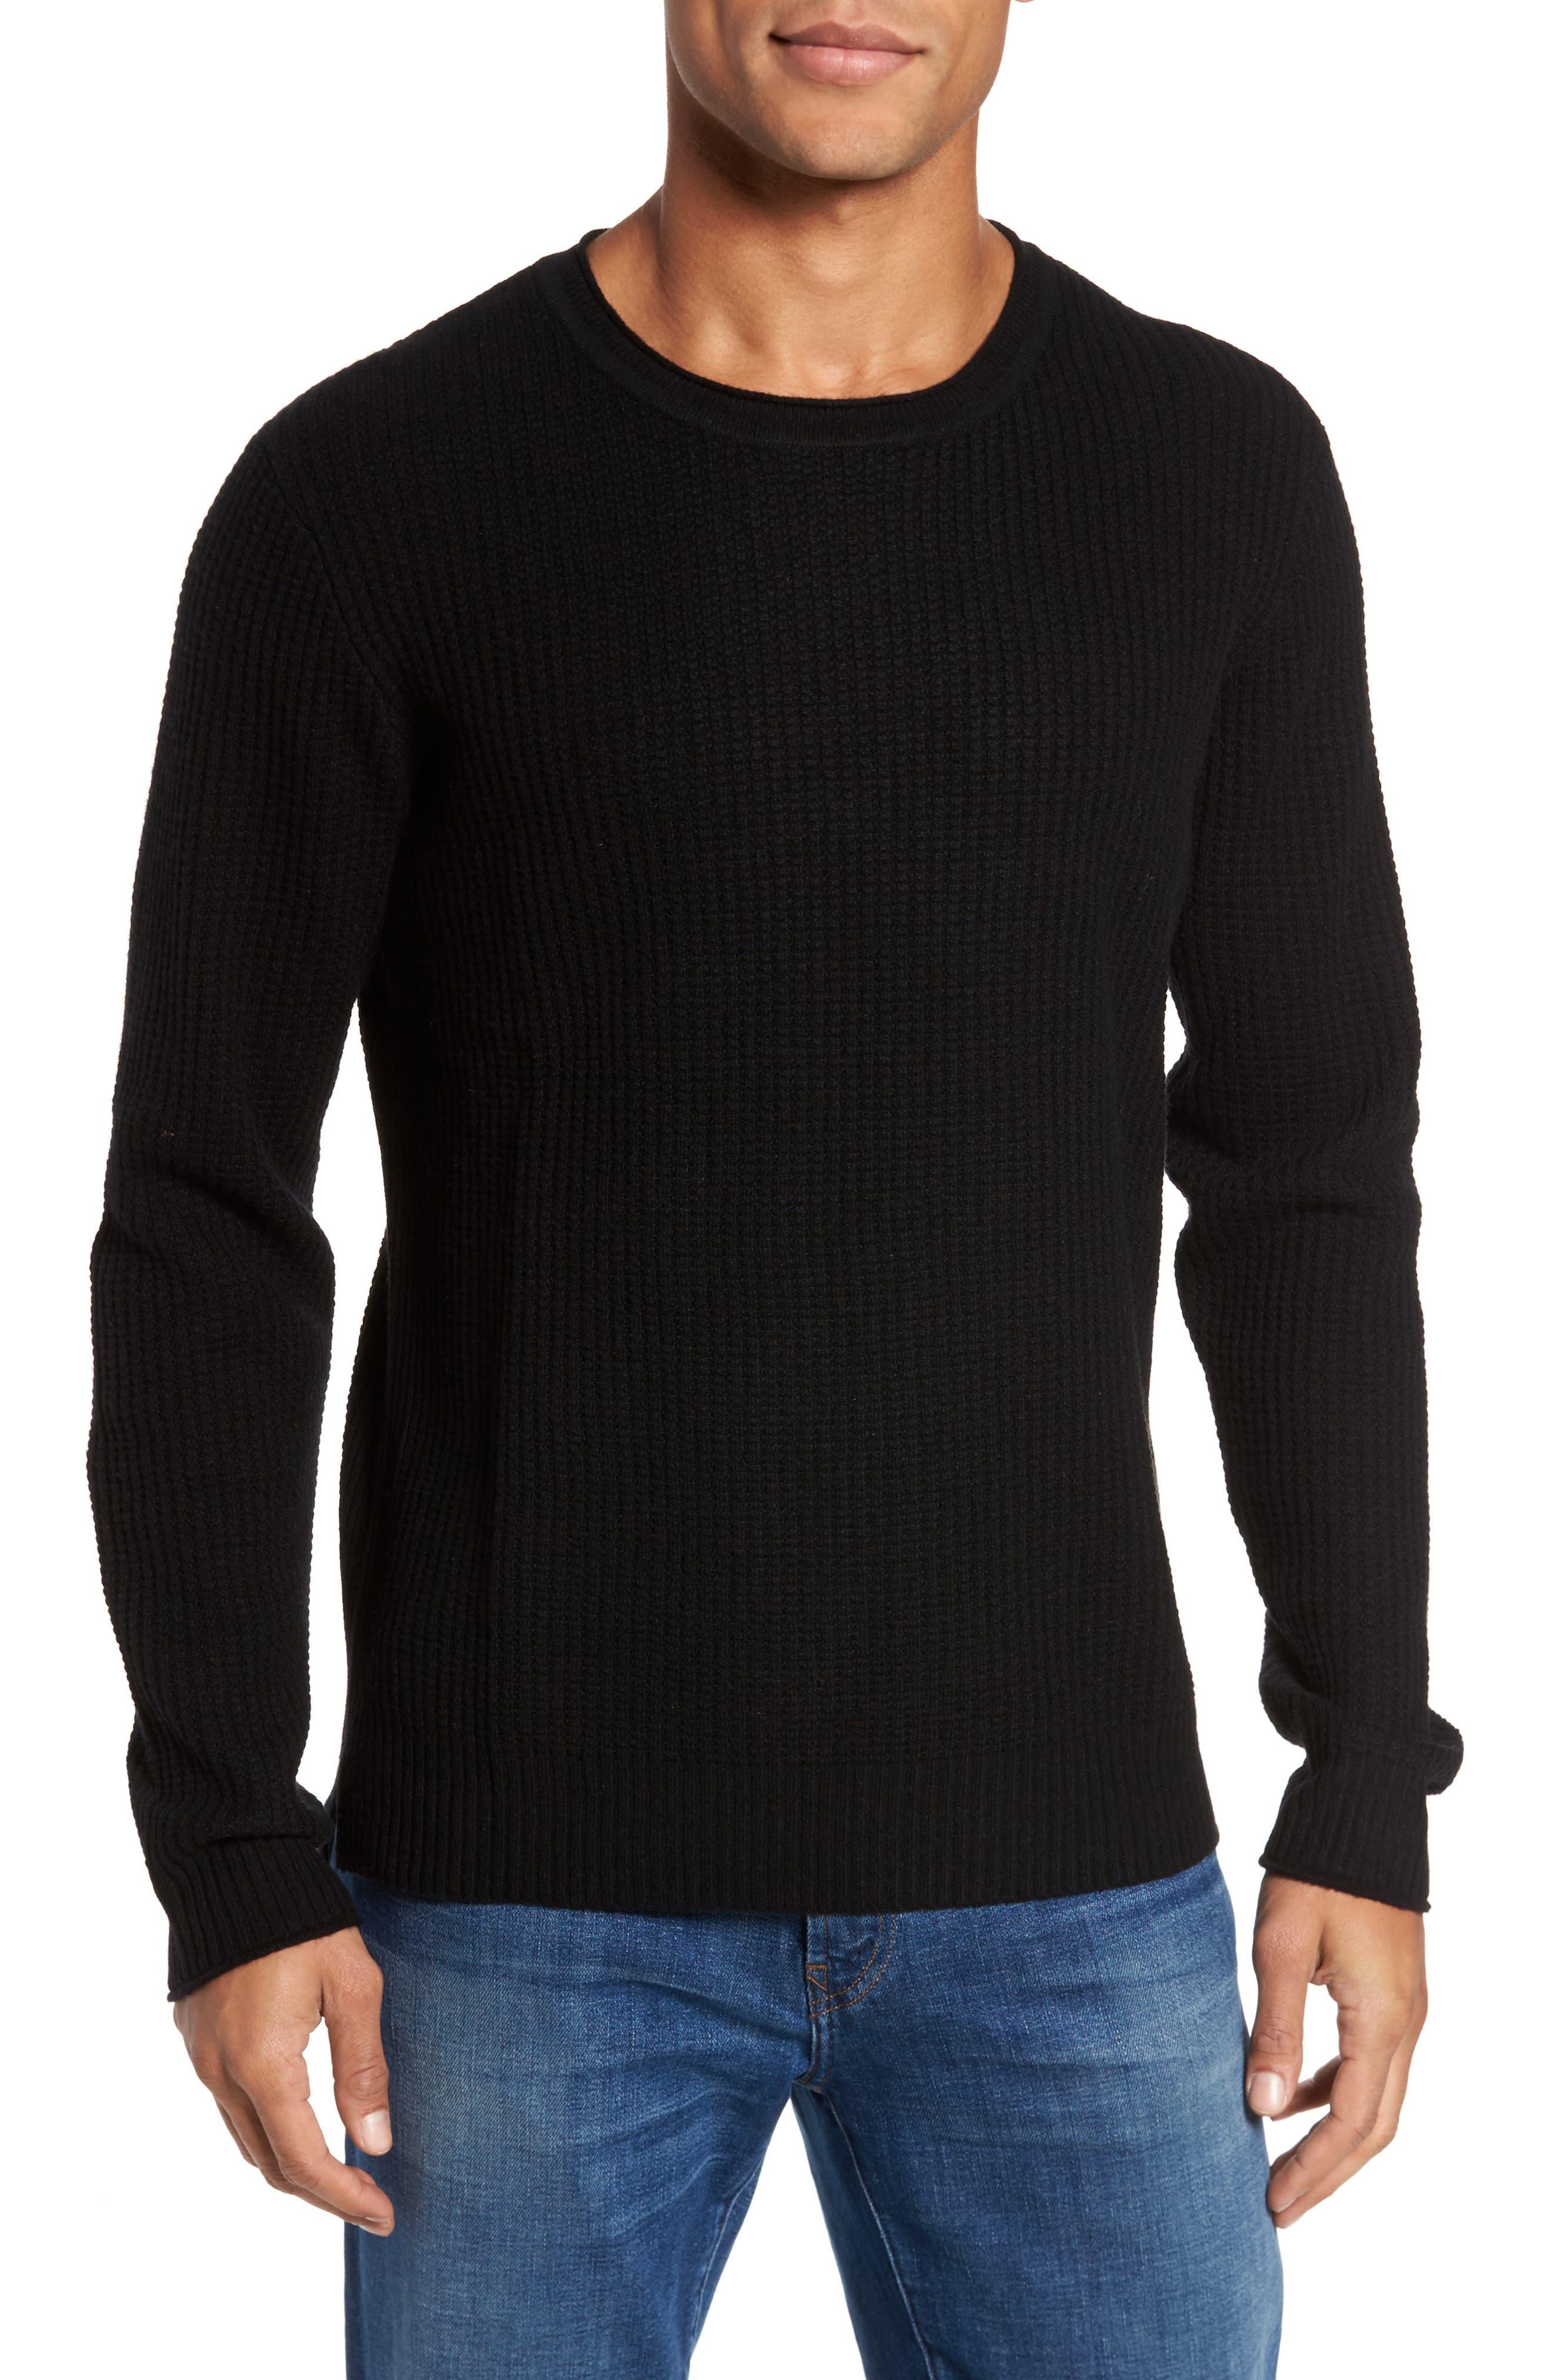 Deklyn Slim Fit Merino & Cashmere Sweatshirt,                         Main,                         color, 001